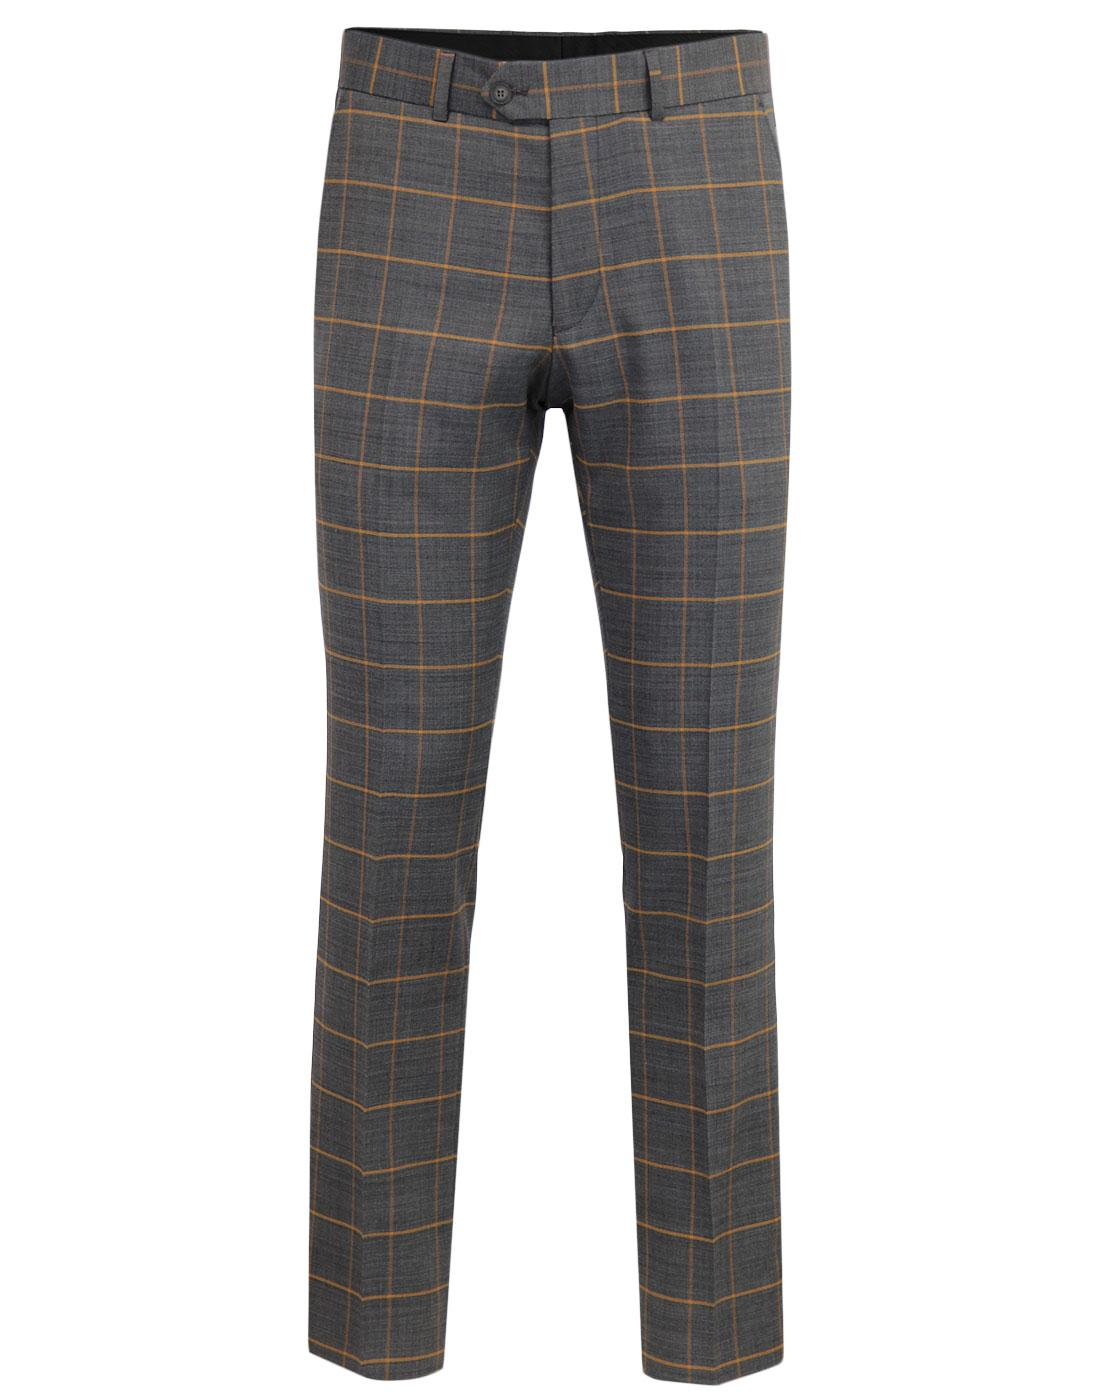 Marriott GIBSON LONDON Windowpane Check Trousers